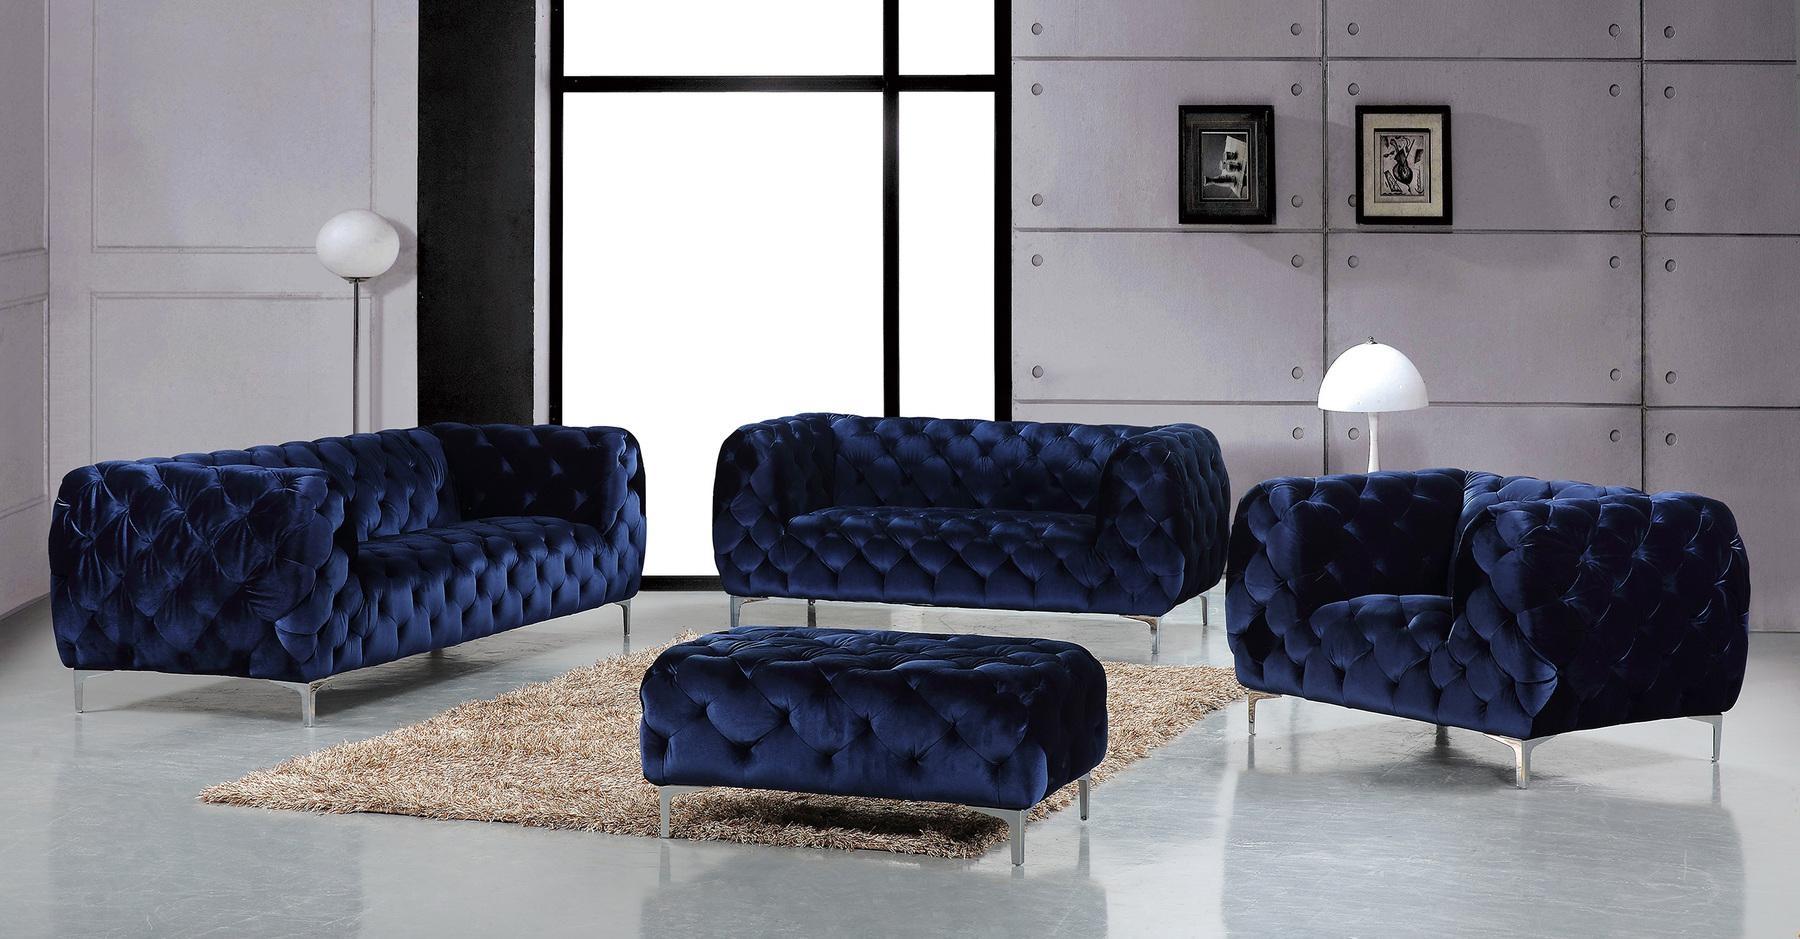 Mercer Navy Sofa 646 Meridian Furniture Fabric Sofas At Comfyco Pertaining To Black Velvet Sofas (Image 9 of 20)